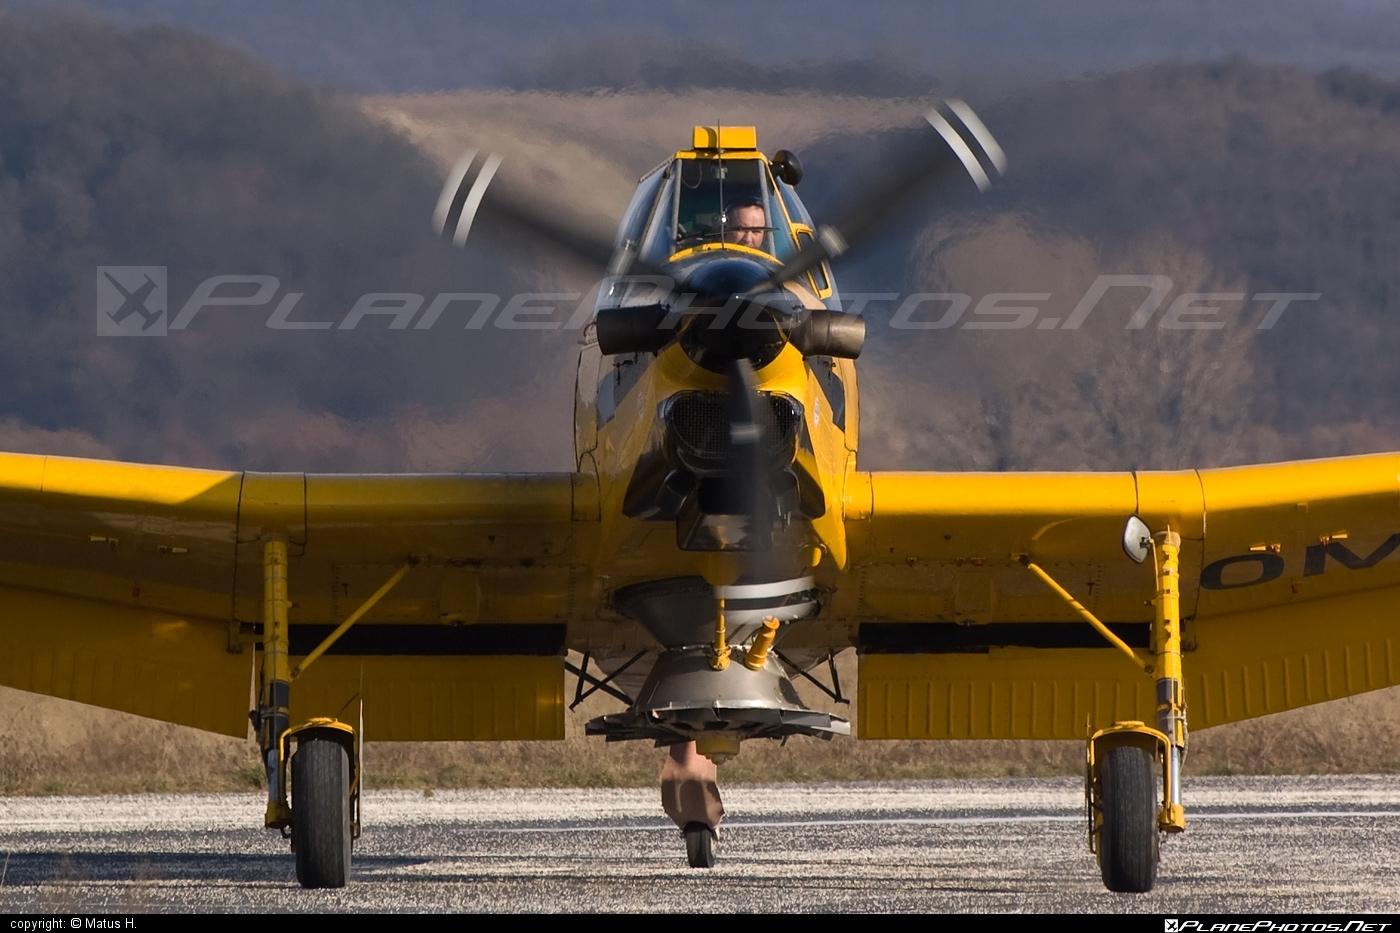 Zlin Z-137T Agro Turbo - OM-VIB operated by AERO SLOVAKIA #aeroslovakia #agroturbo #z137t #zlin #zlin137agroturbo #zlin137t